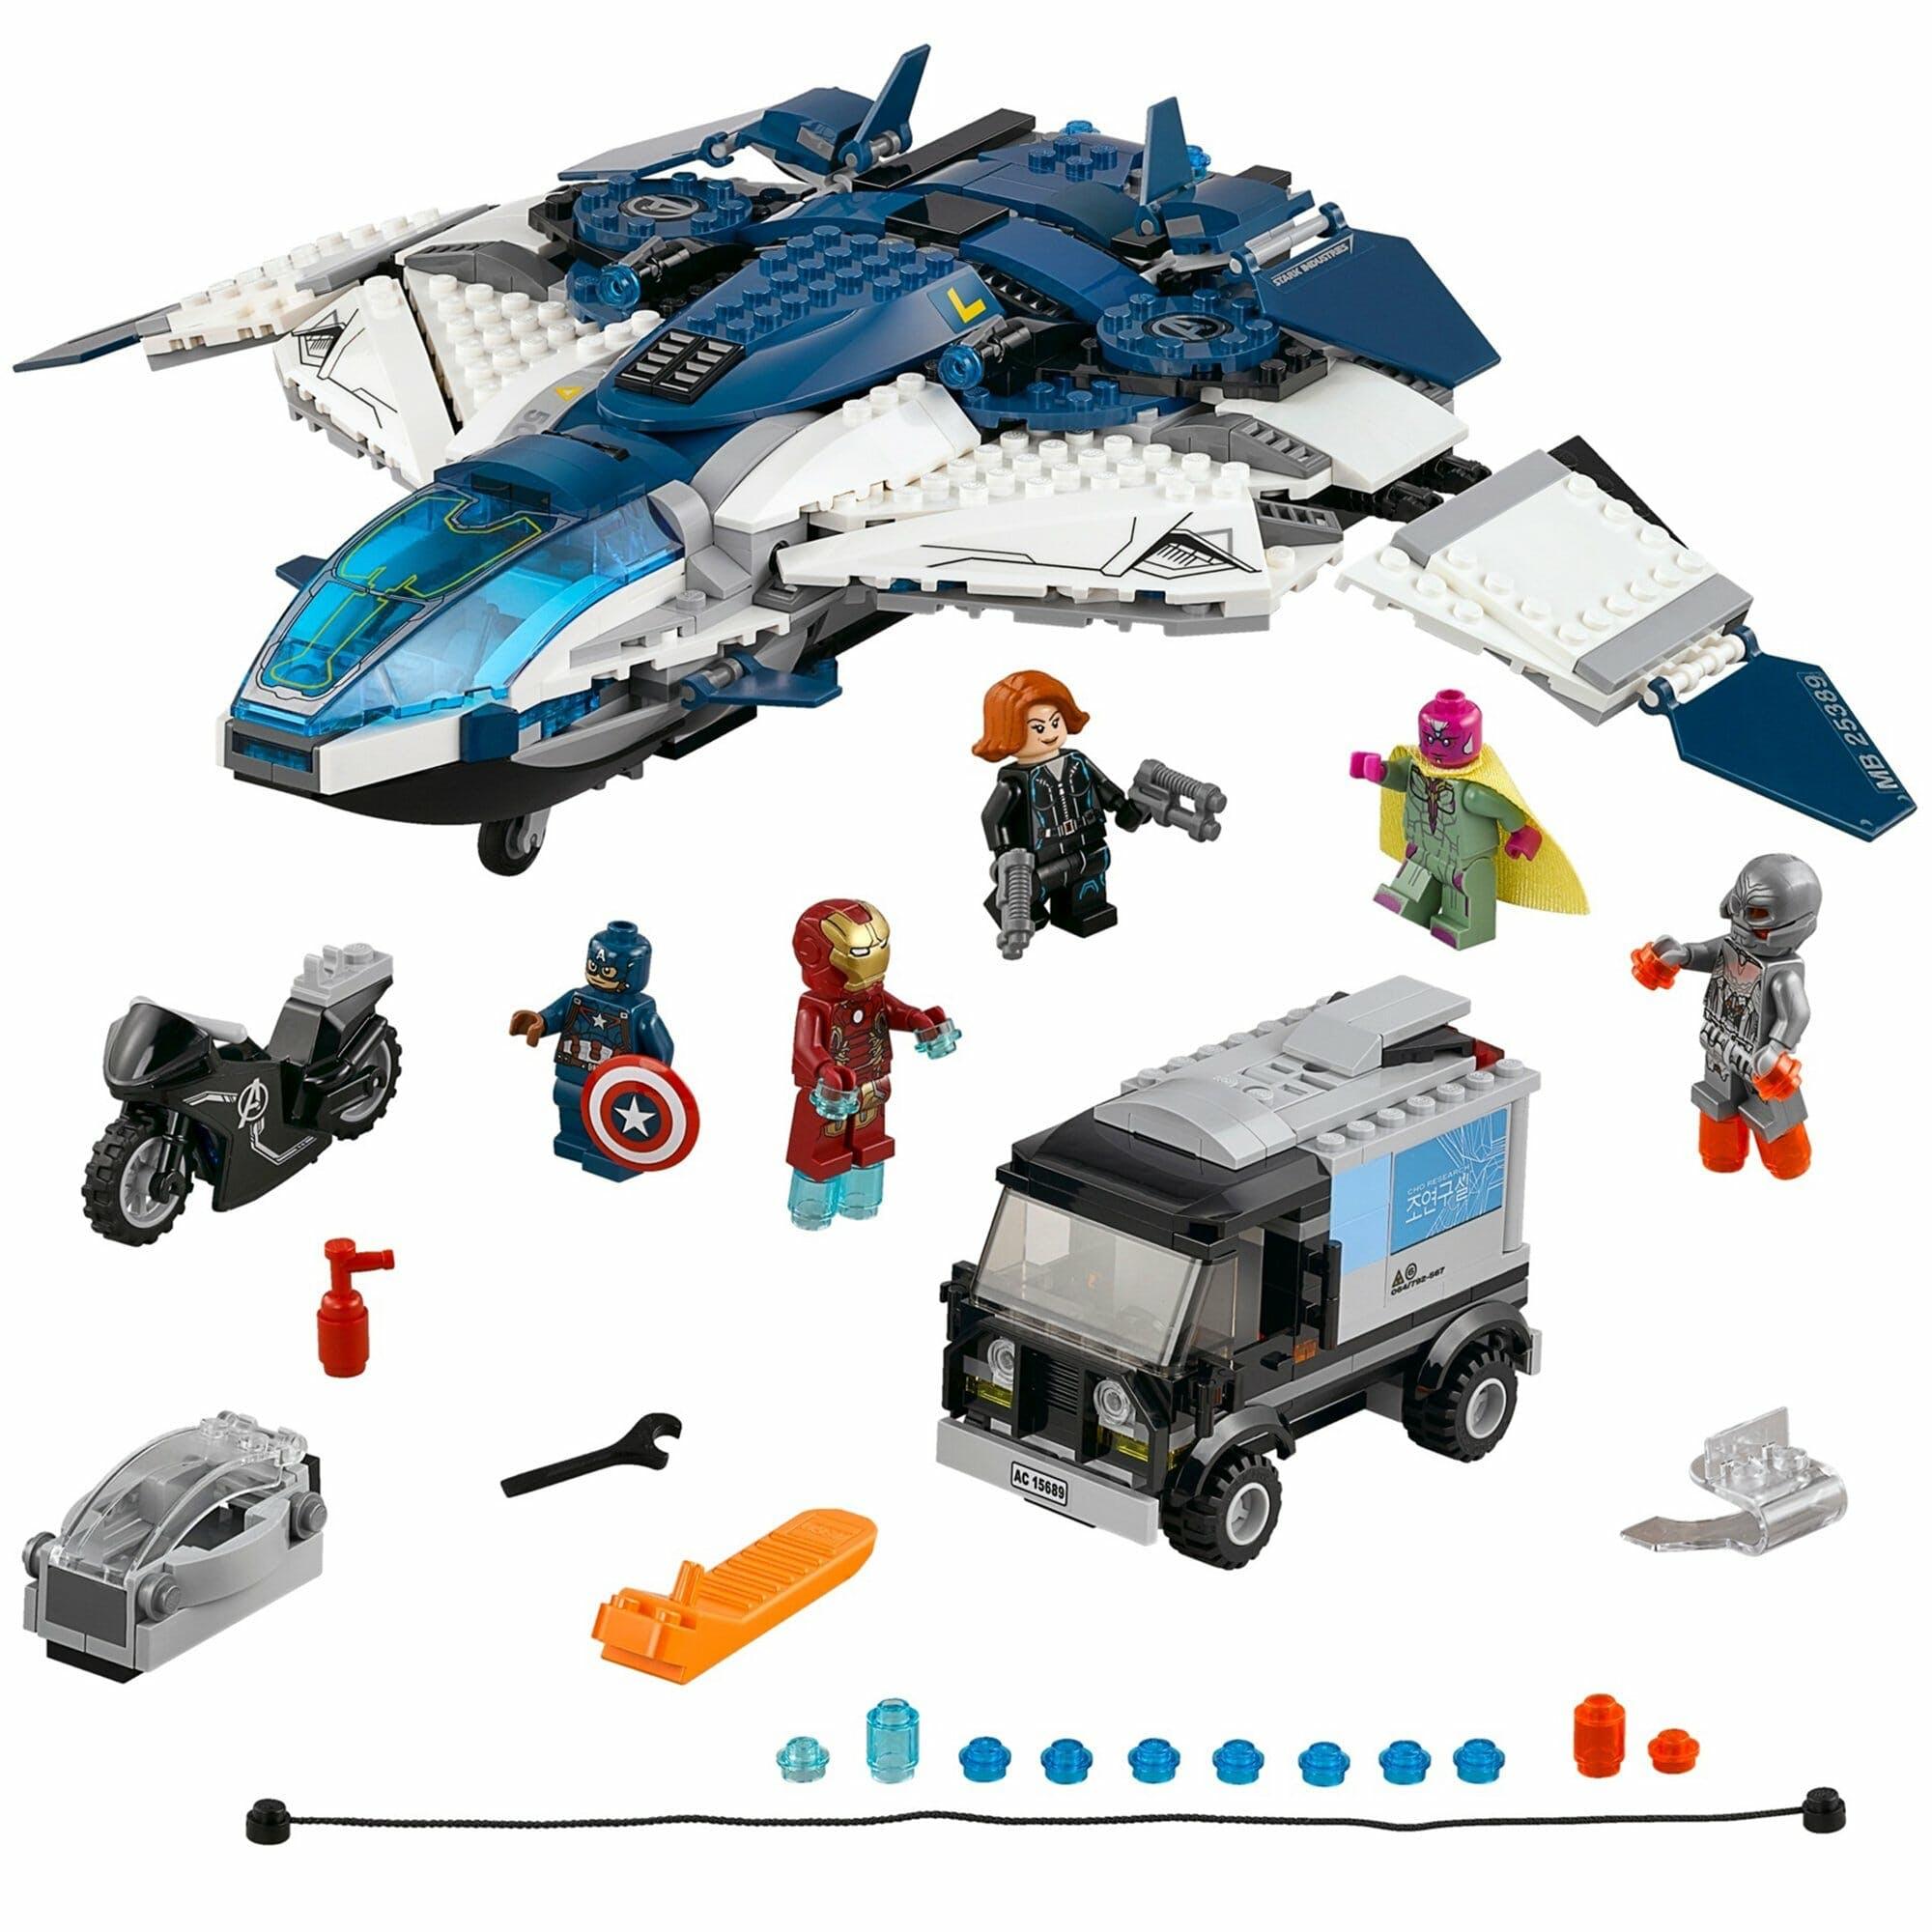 marvel lego sets : Avengers Quinjet City Chase